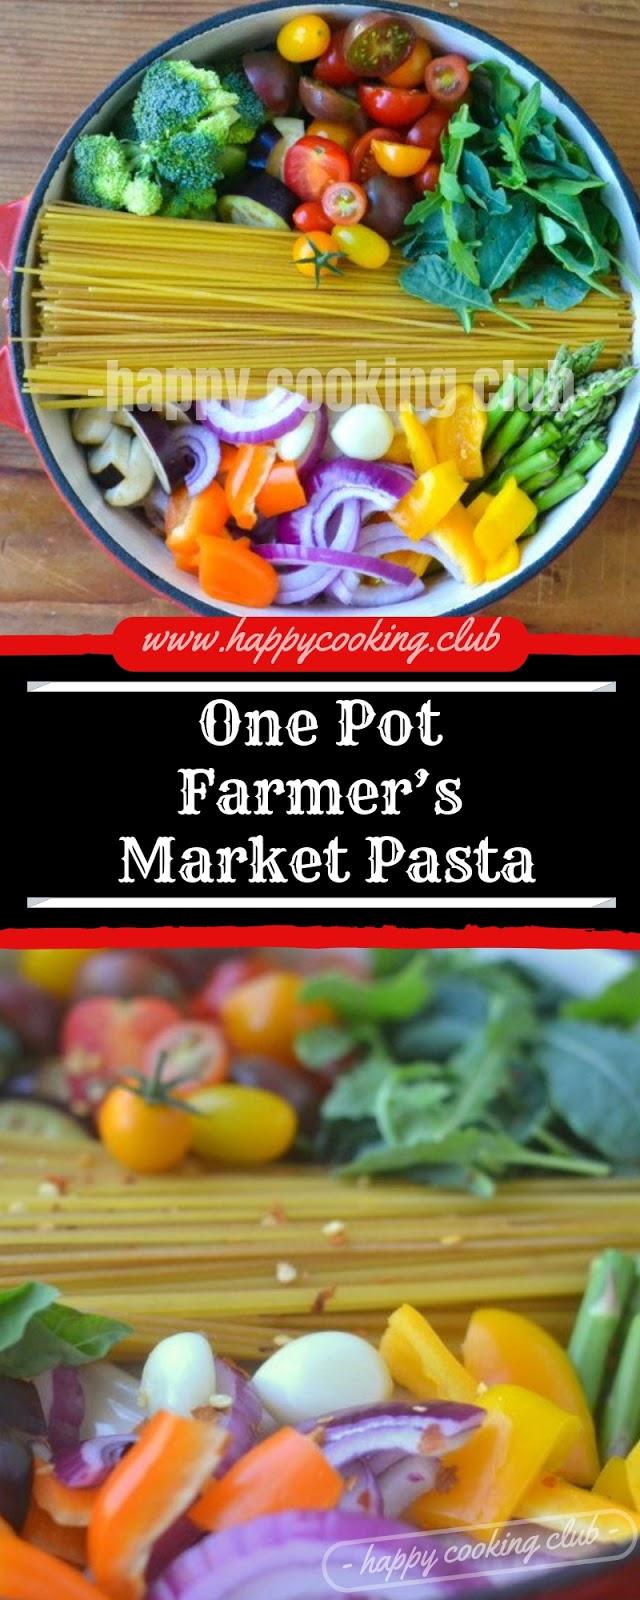 One Pot Farmer's Market Pasta